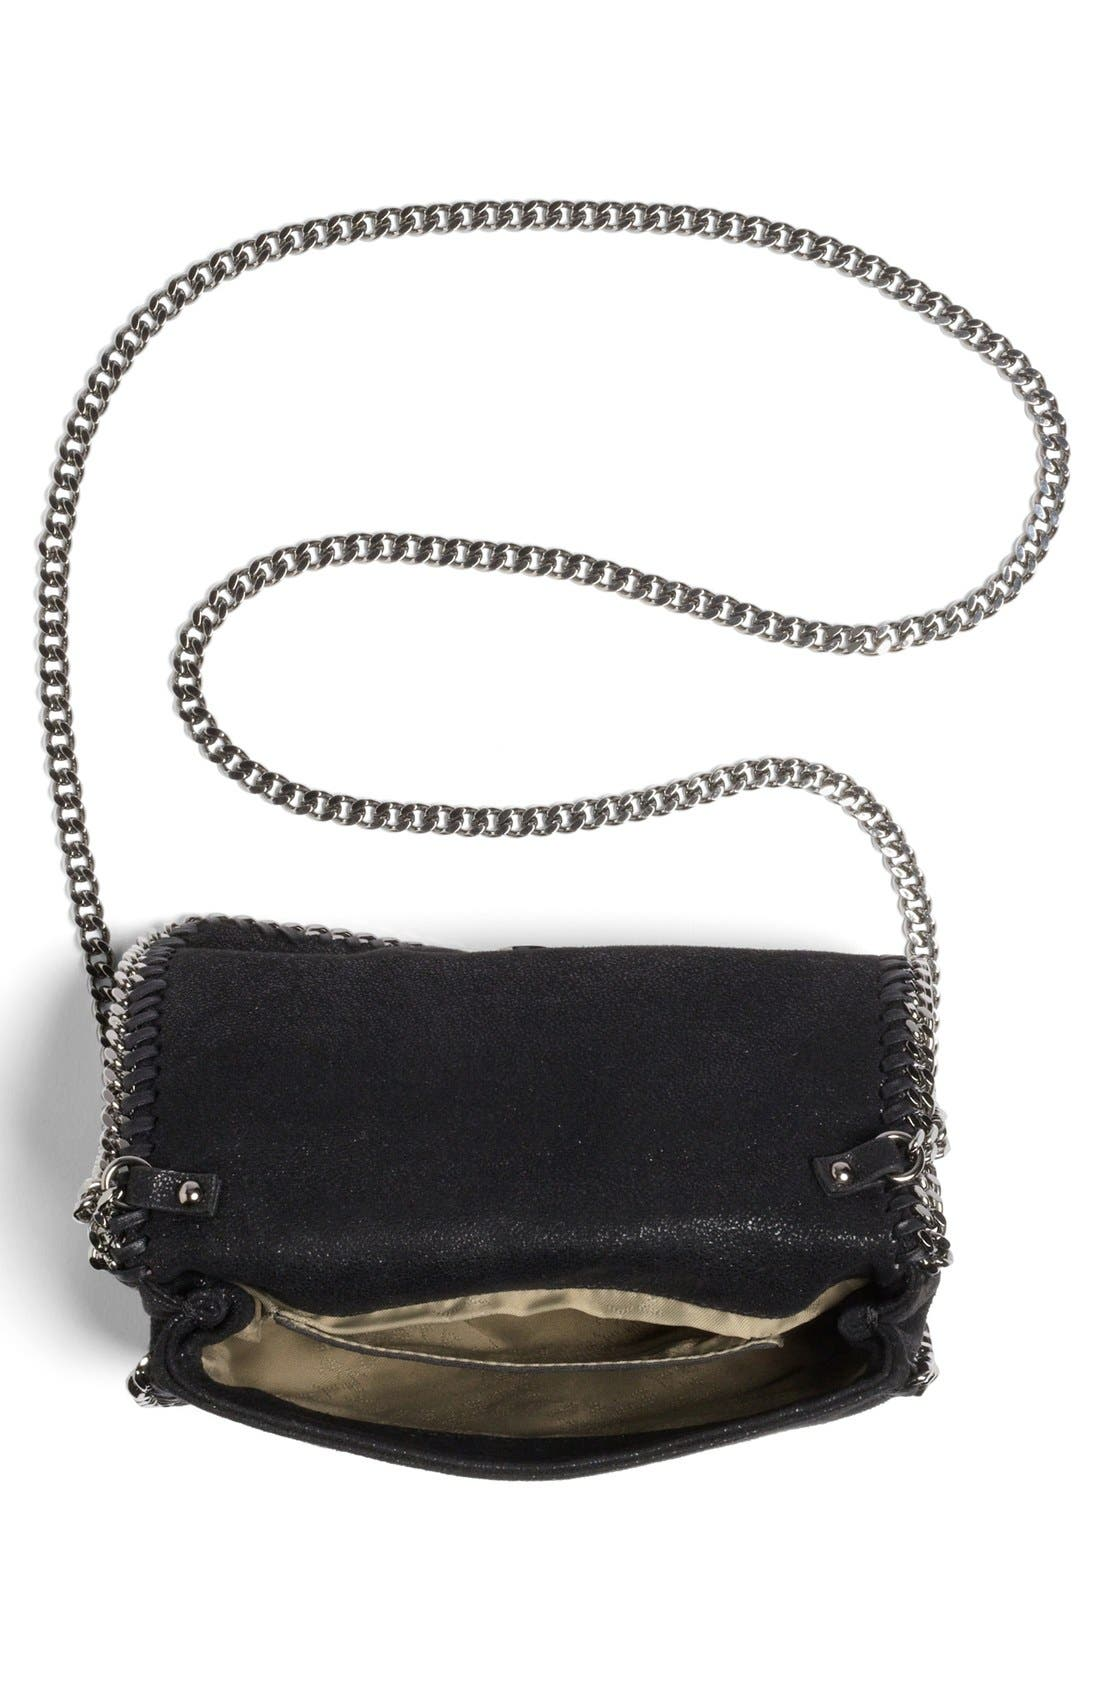 'Falabella - Shaggy Deer' Faux Leather Crossbody Bag,                             Alternate thumbnail 9, color,                             BLACK SLVR HRDWR